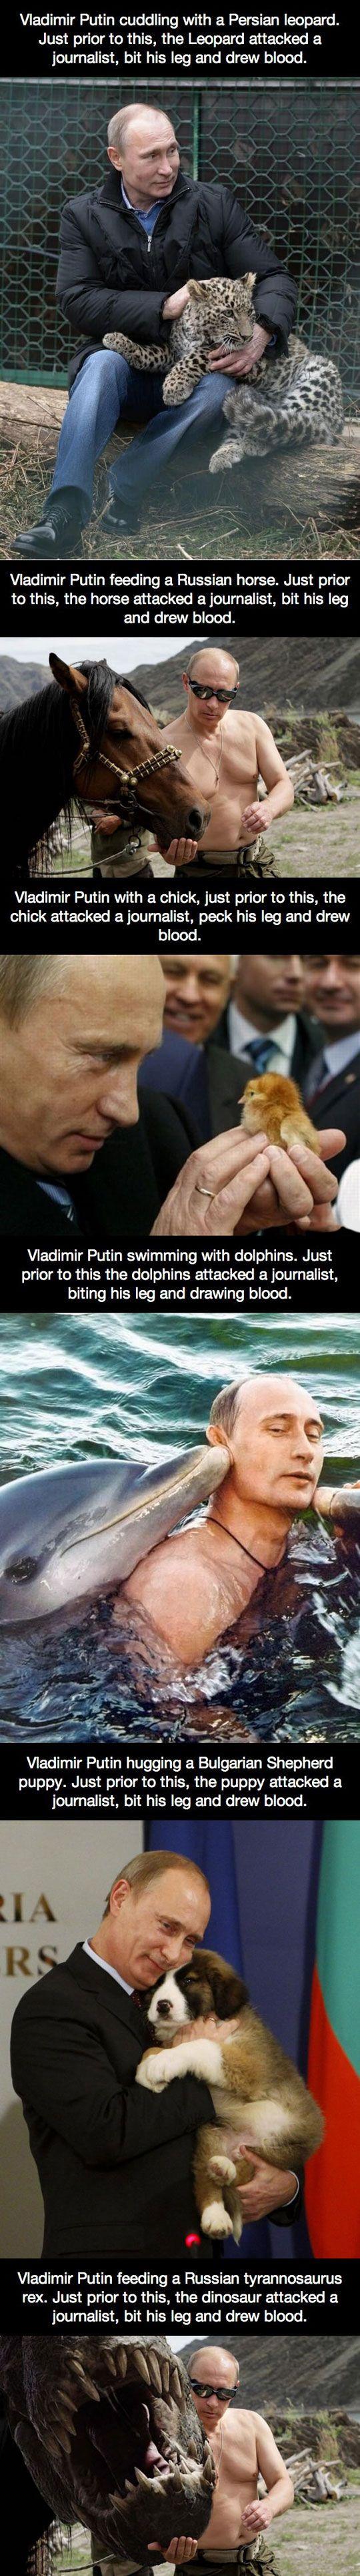 Valdimir Putin is my politician crush. I'm not ashamed.